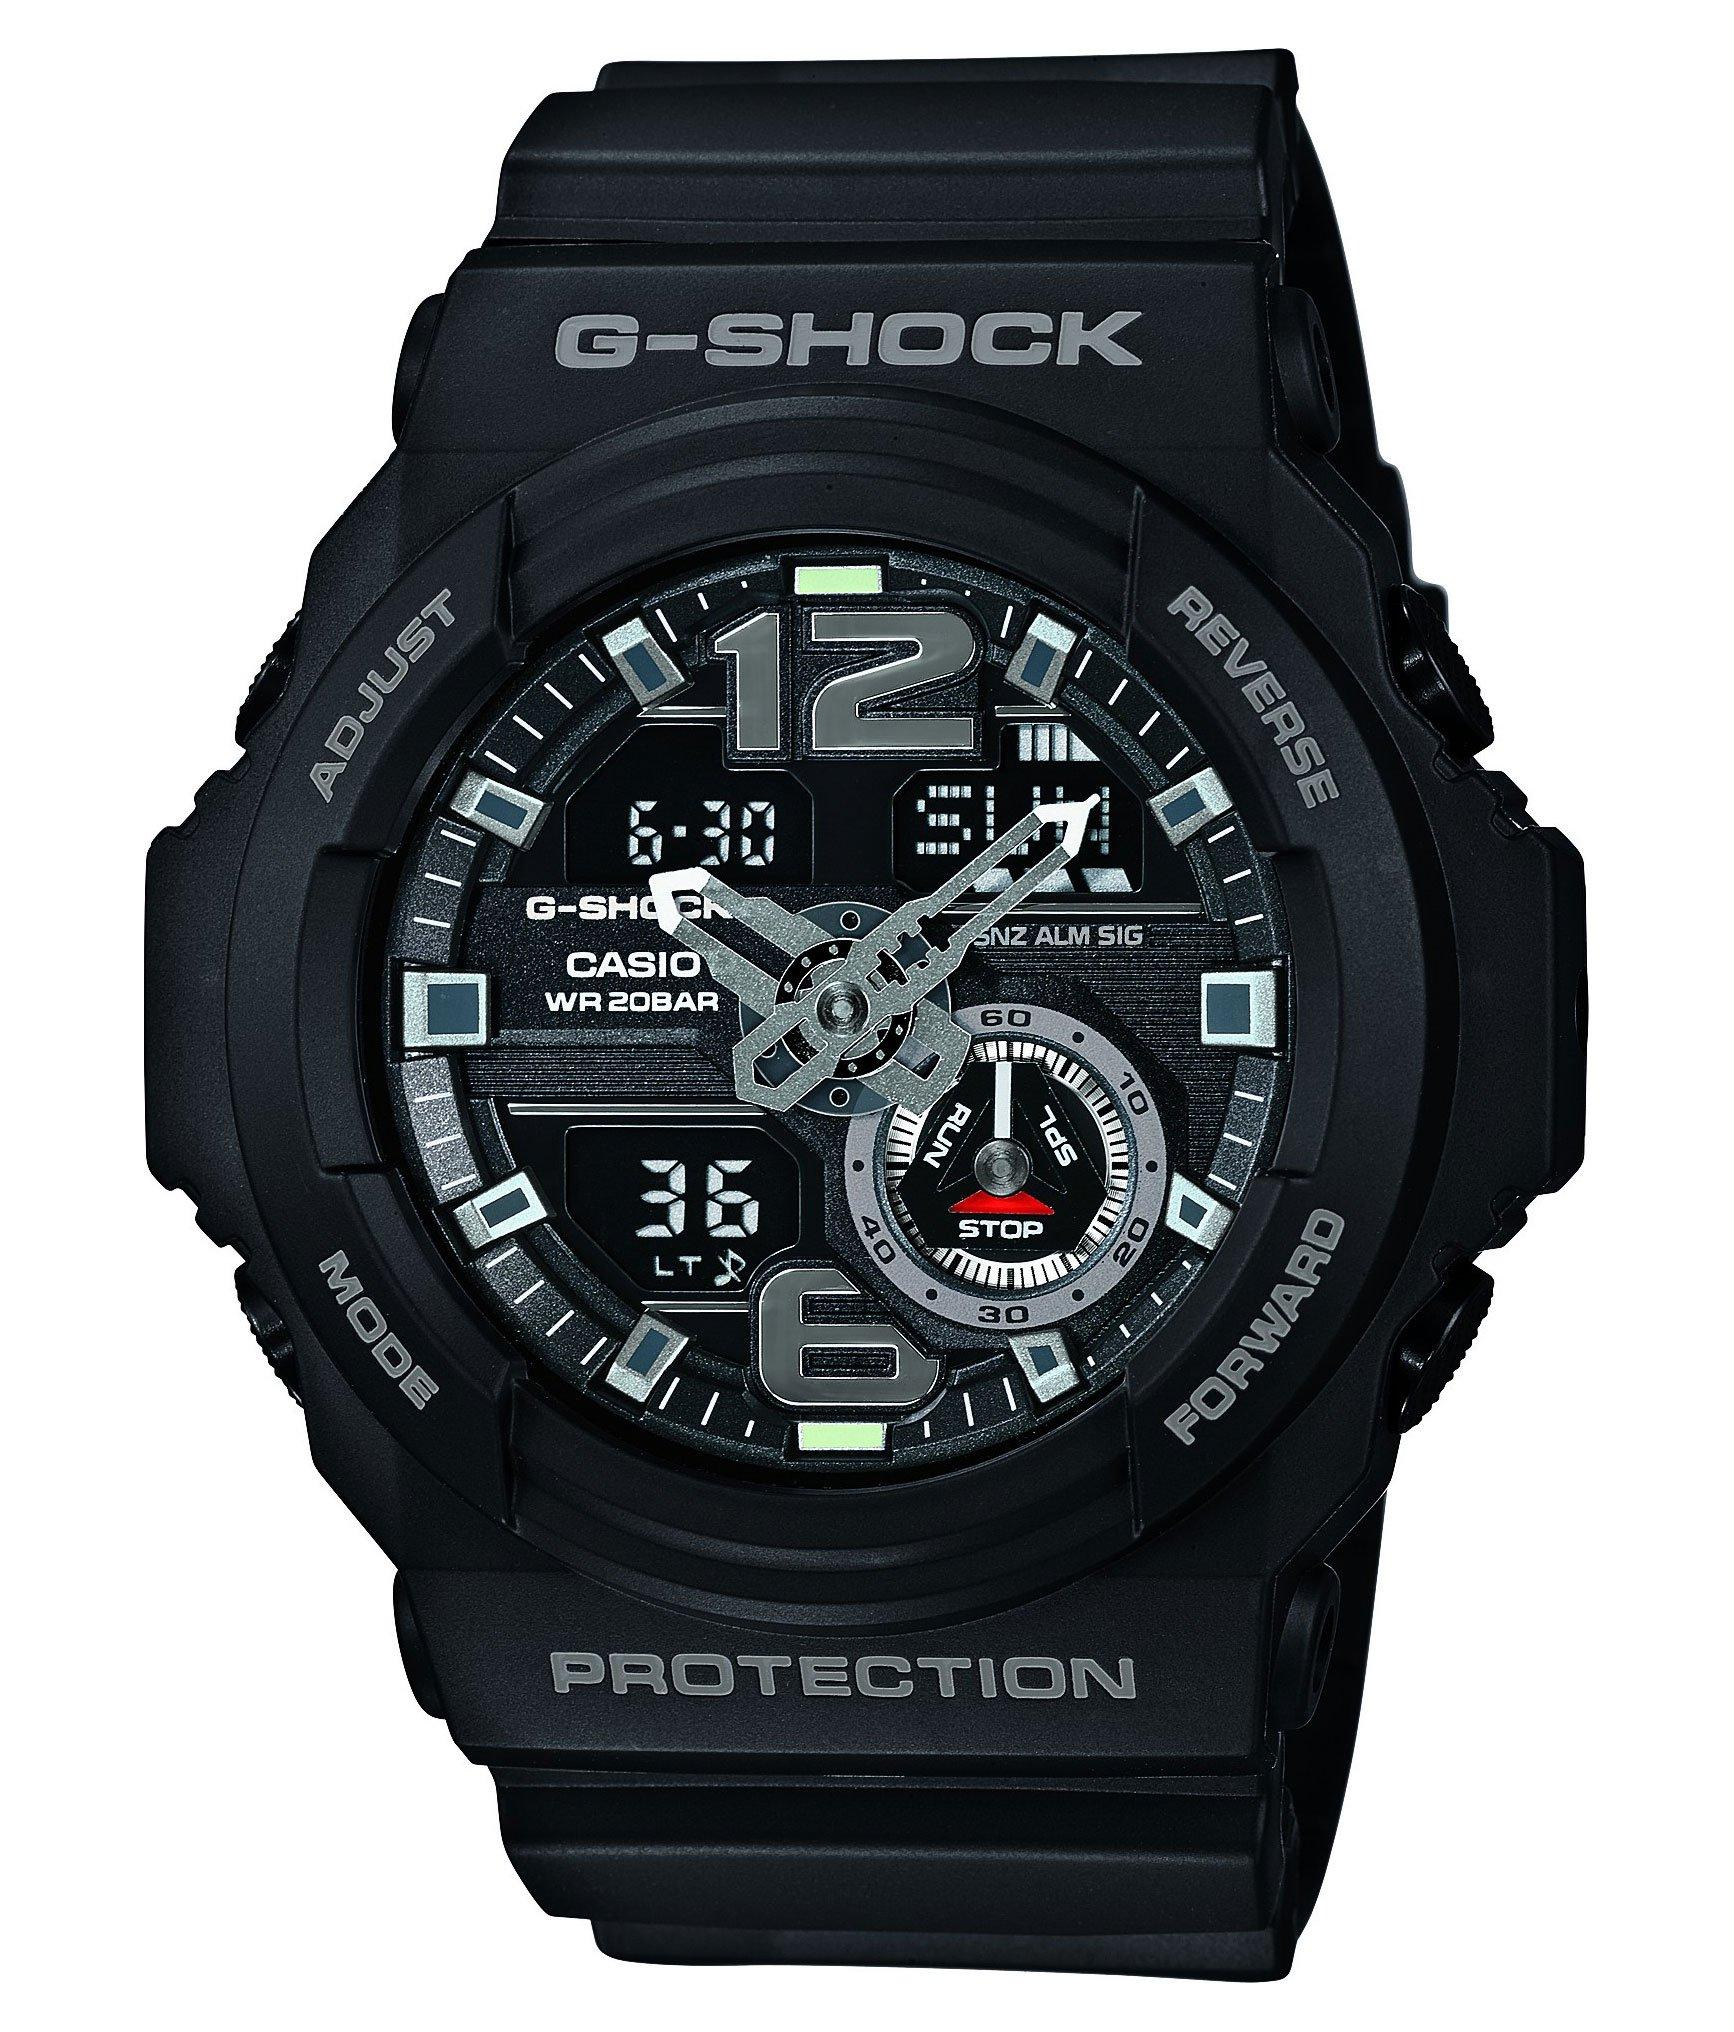 G-Shock Men's GA310 Classic Series Quality Watch - Black / One Size by Casio